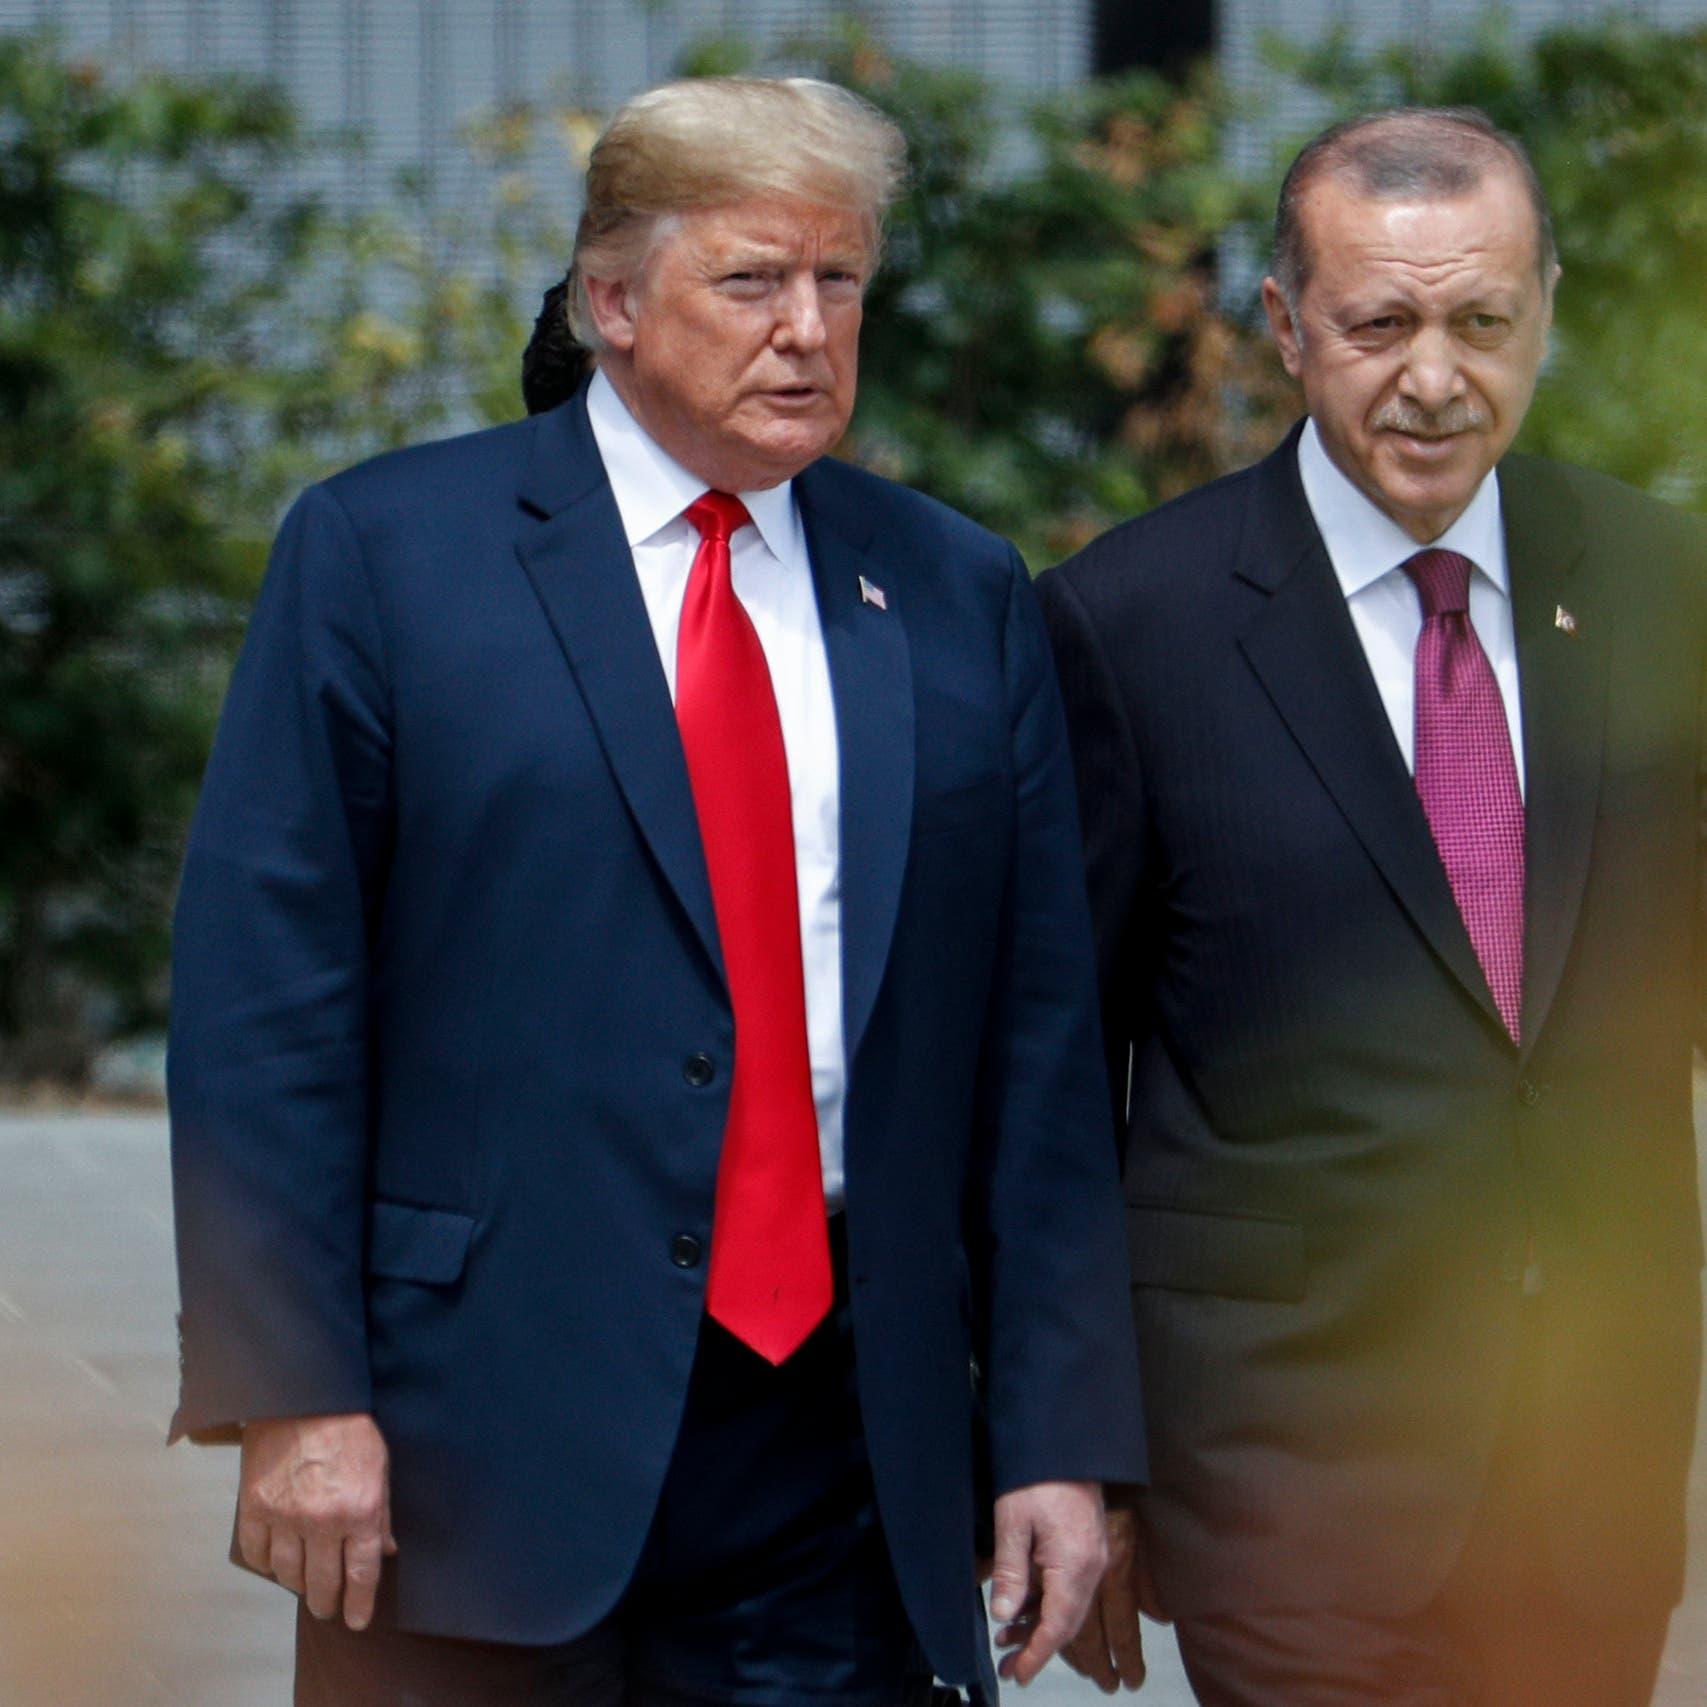 مسؤول أميركي يكشف: هذا ما دار بين ترمب وأردوغان